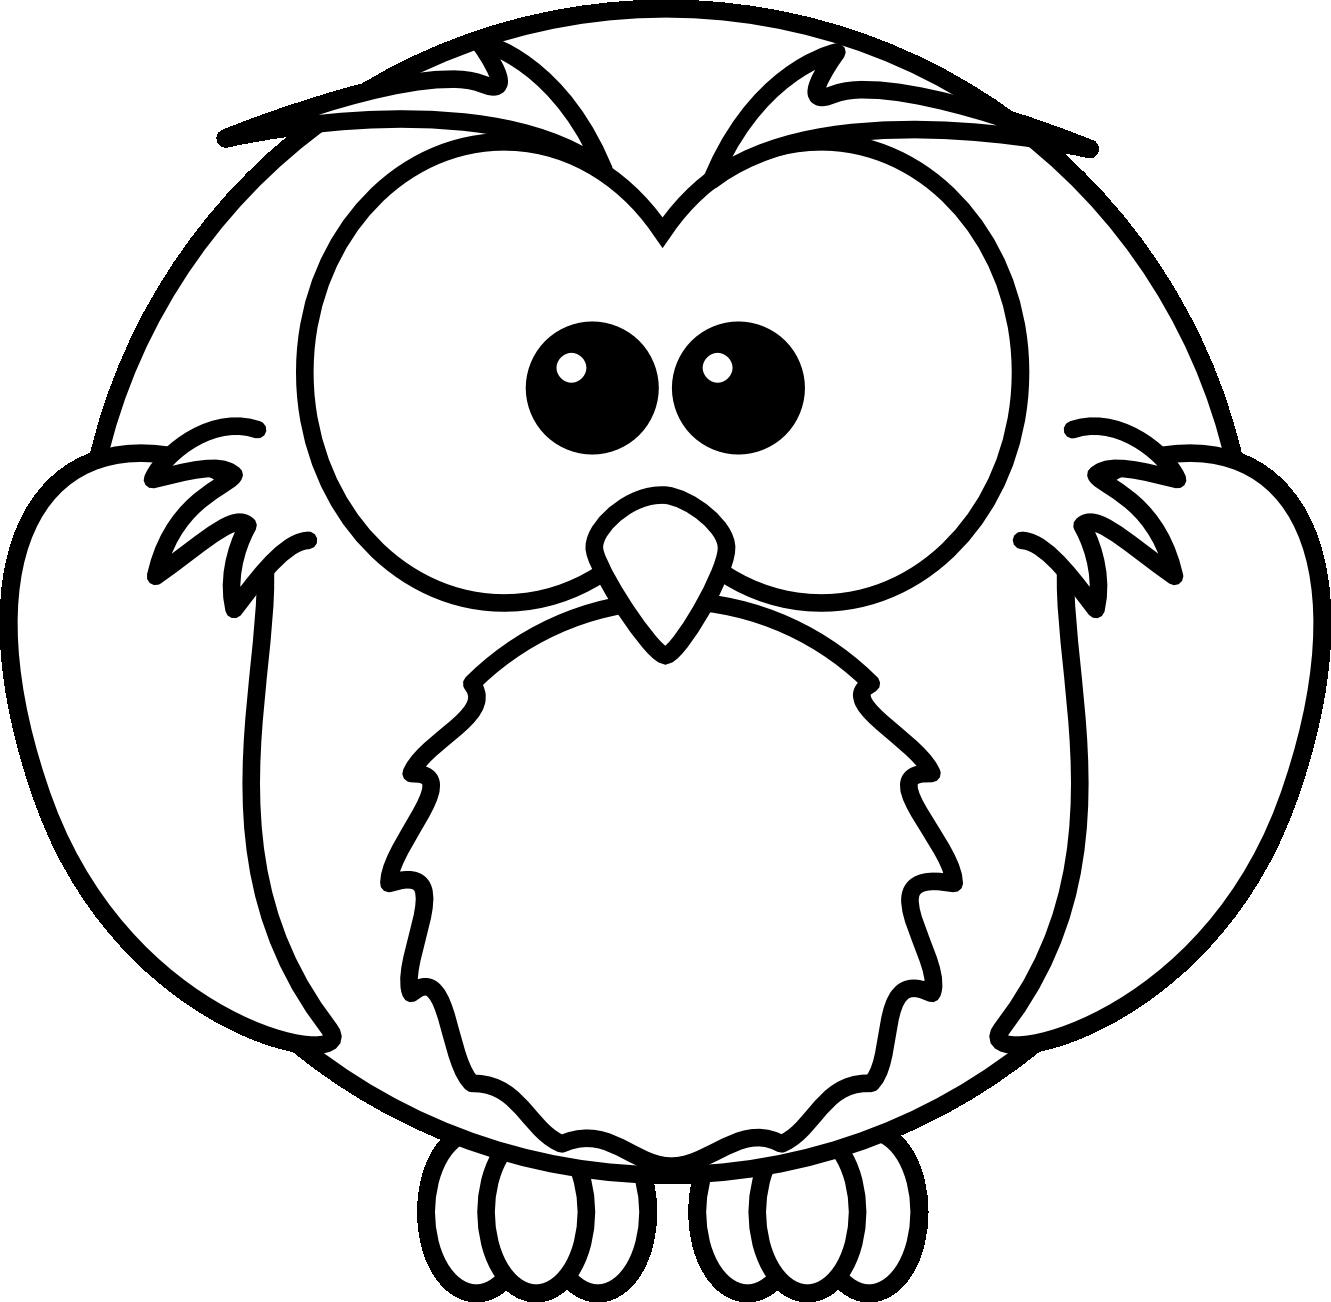 owl black white line art clipart panda free clipart images rh clipartpanda com black and white clipart pictures of owl baby owl clipart black and white